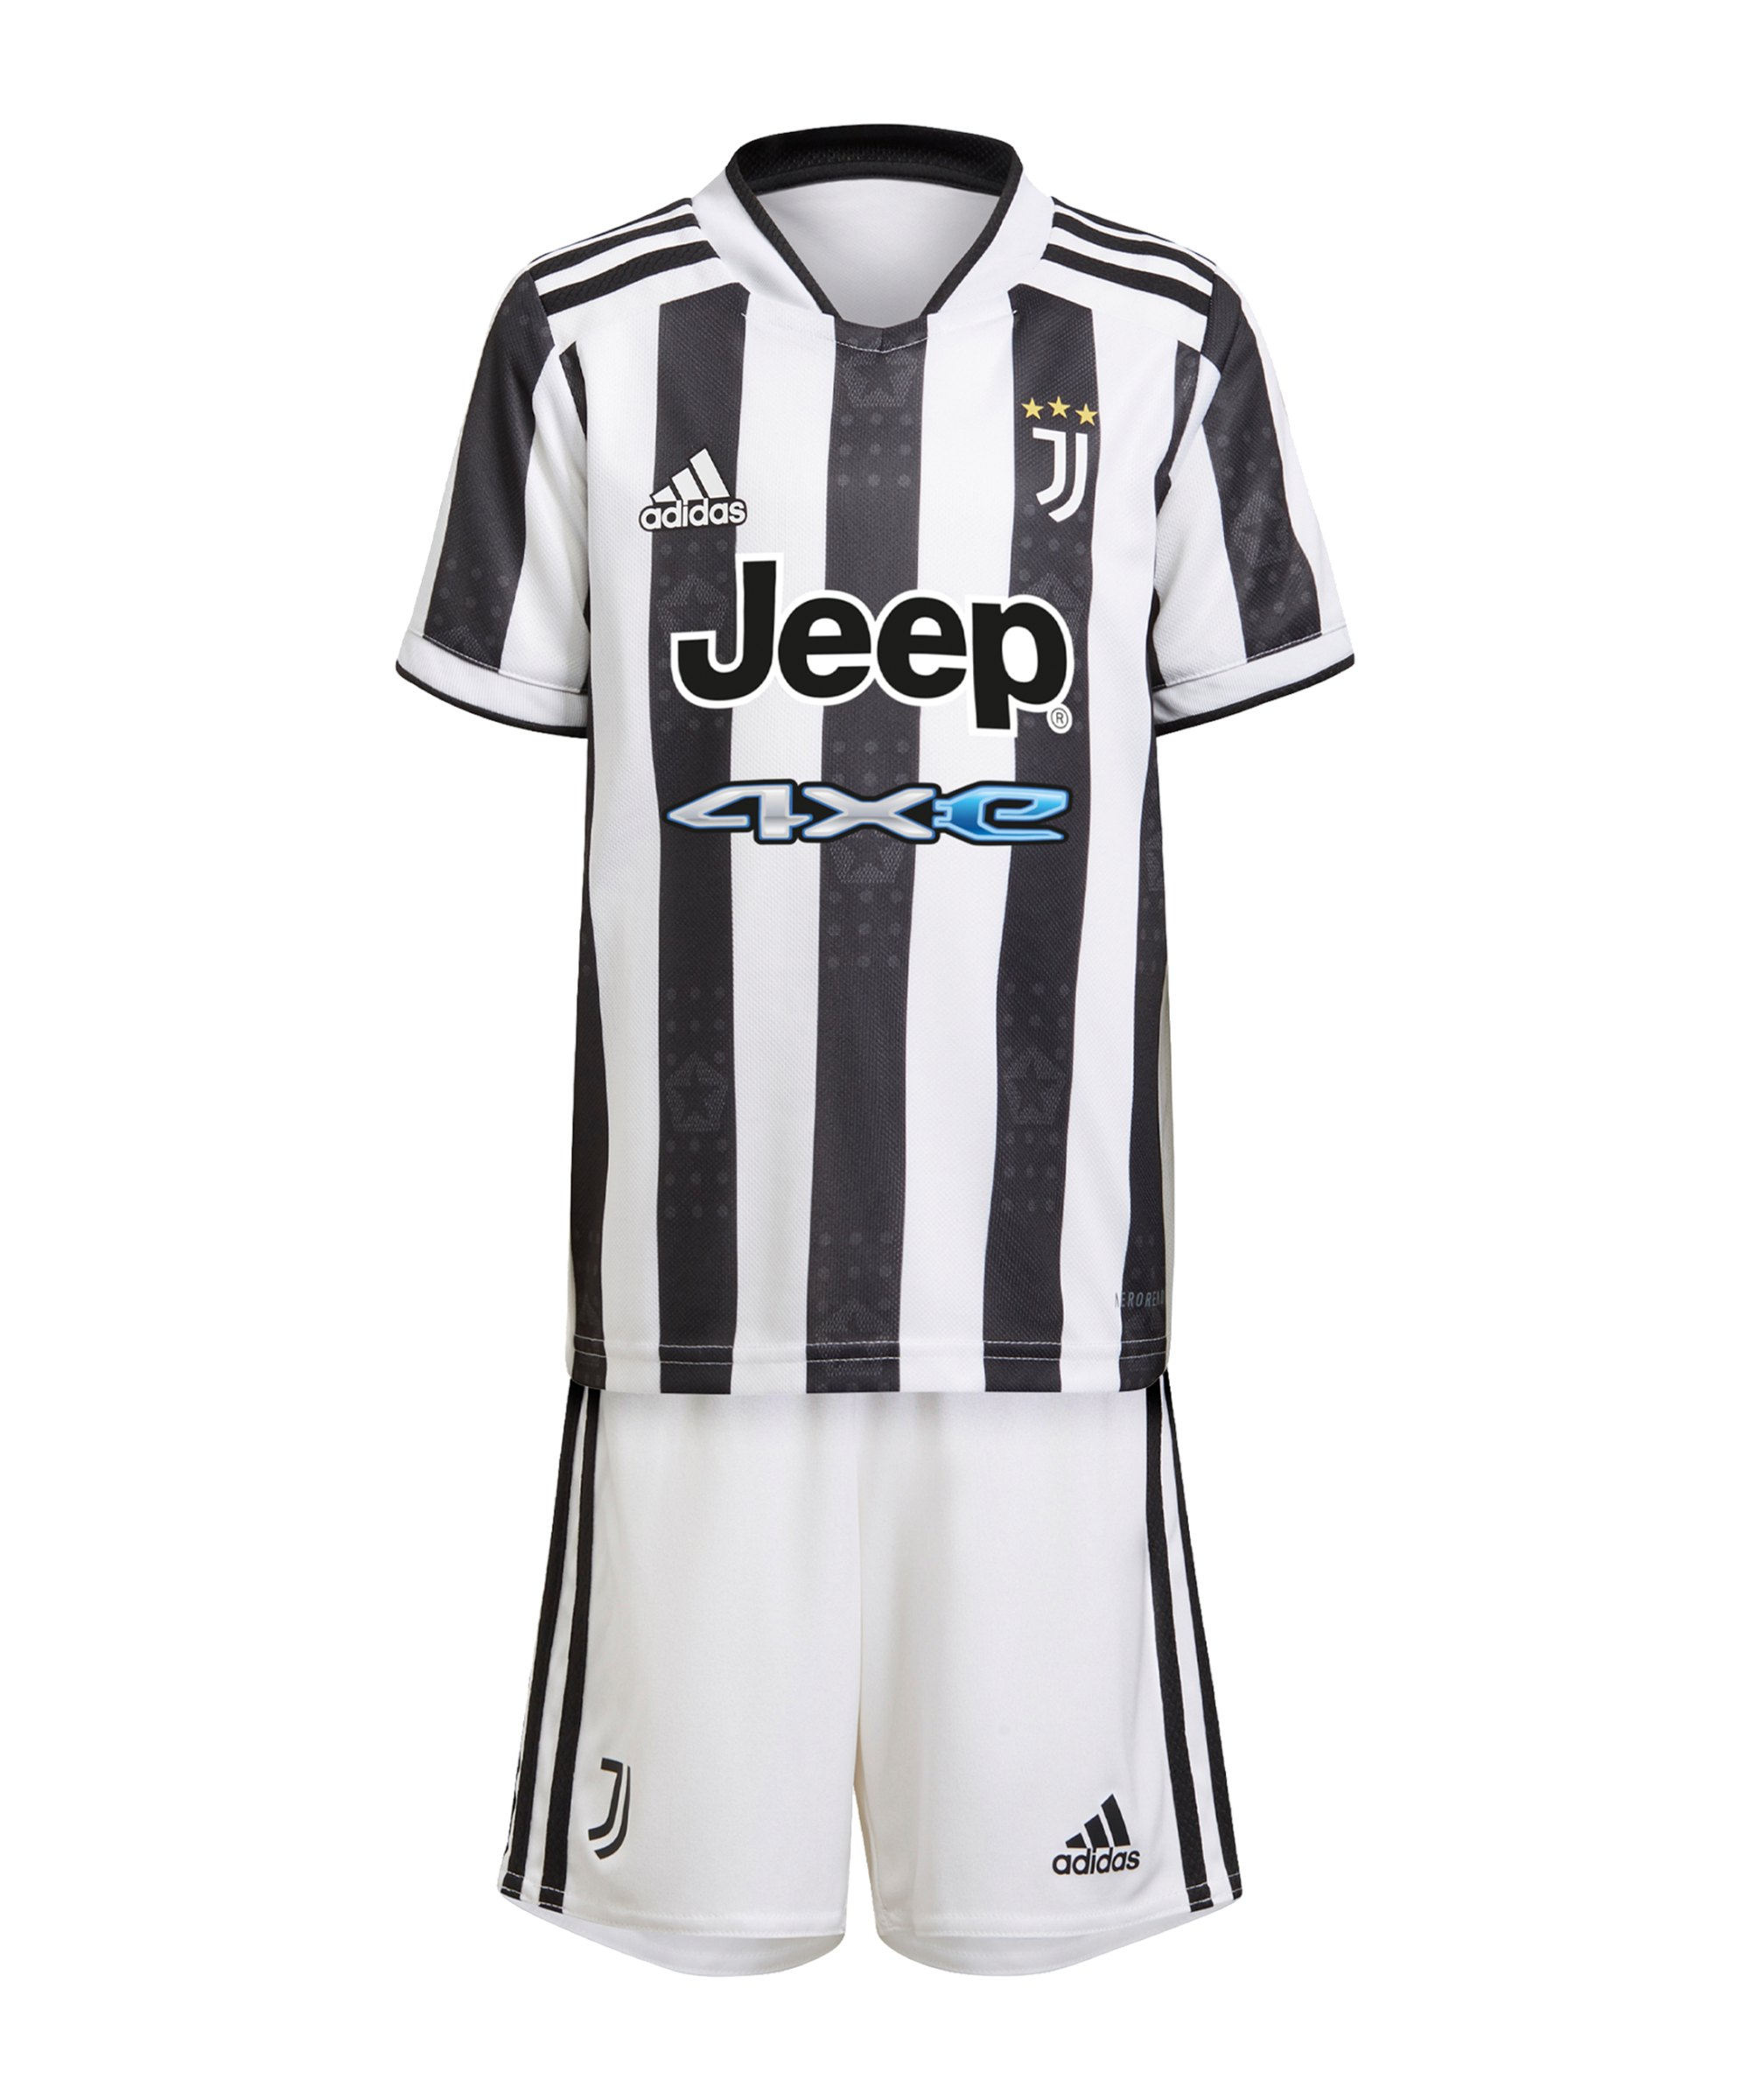 adidas Juventus Turin Minikit Home 2021/2022 Weiss - weiss